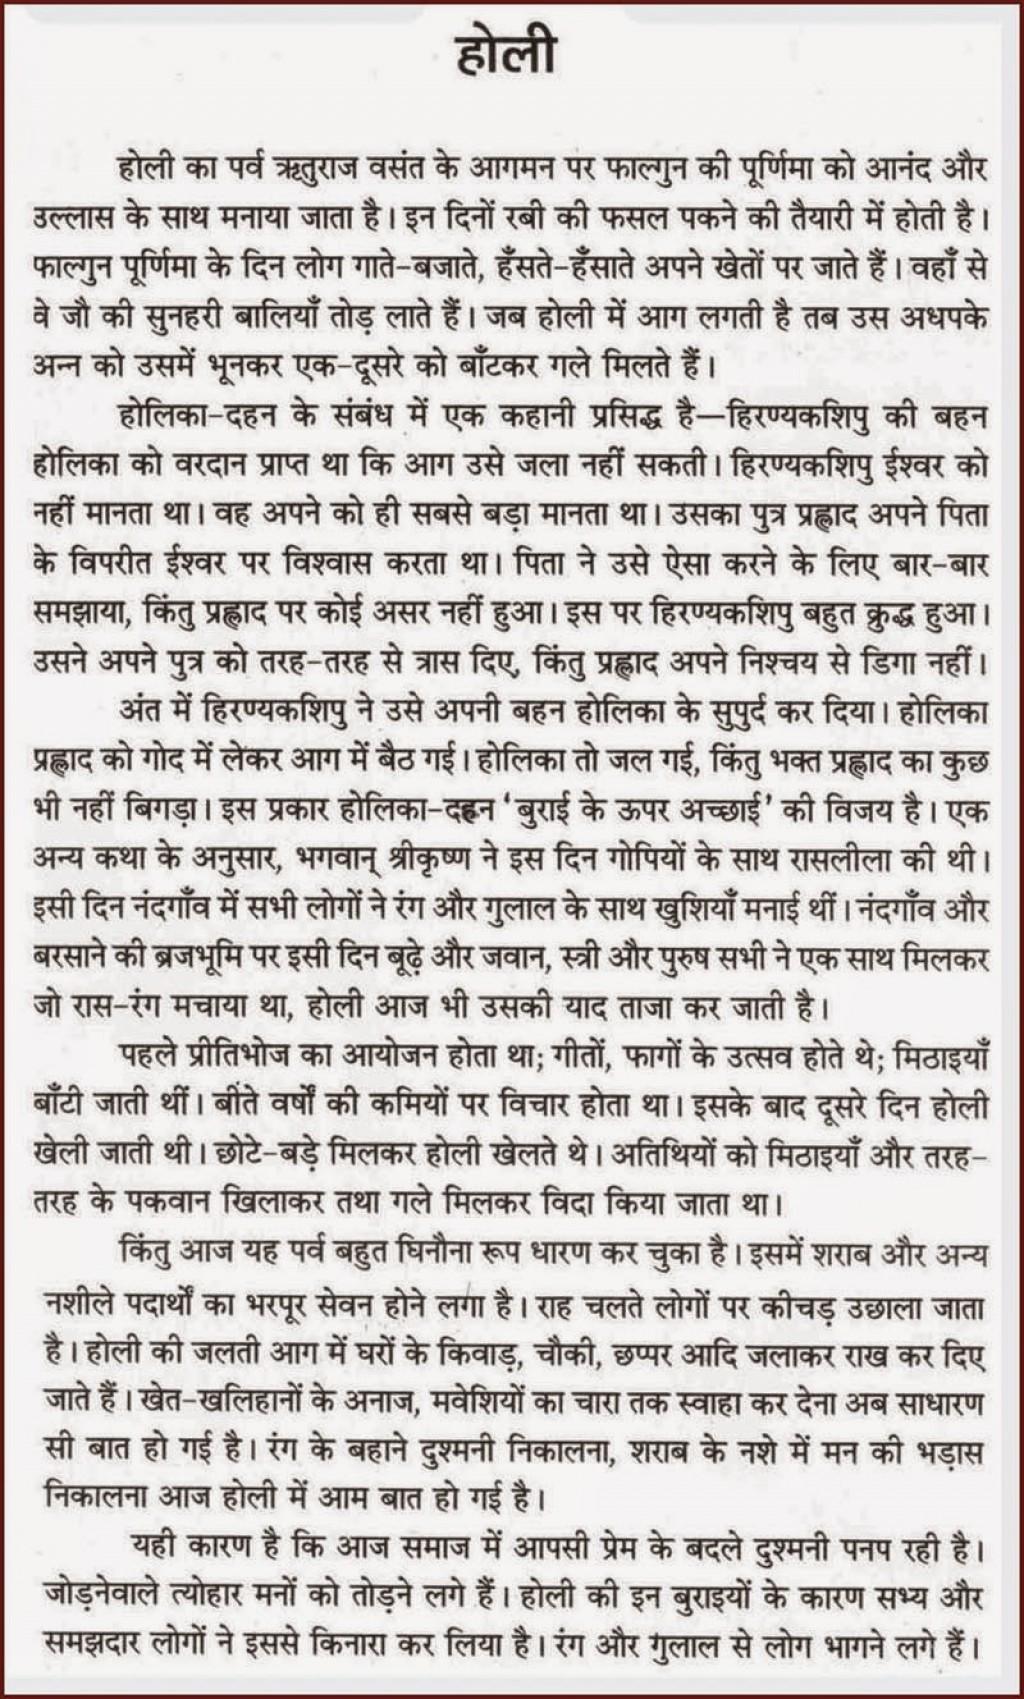 012 Essay Example Happy Holi Hindi Download Impressive On Holidays Are Necessary Evils In Gujarati Festival Punjabi Language Large